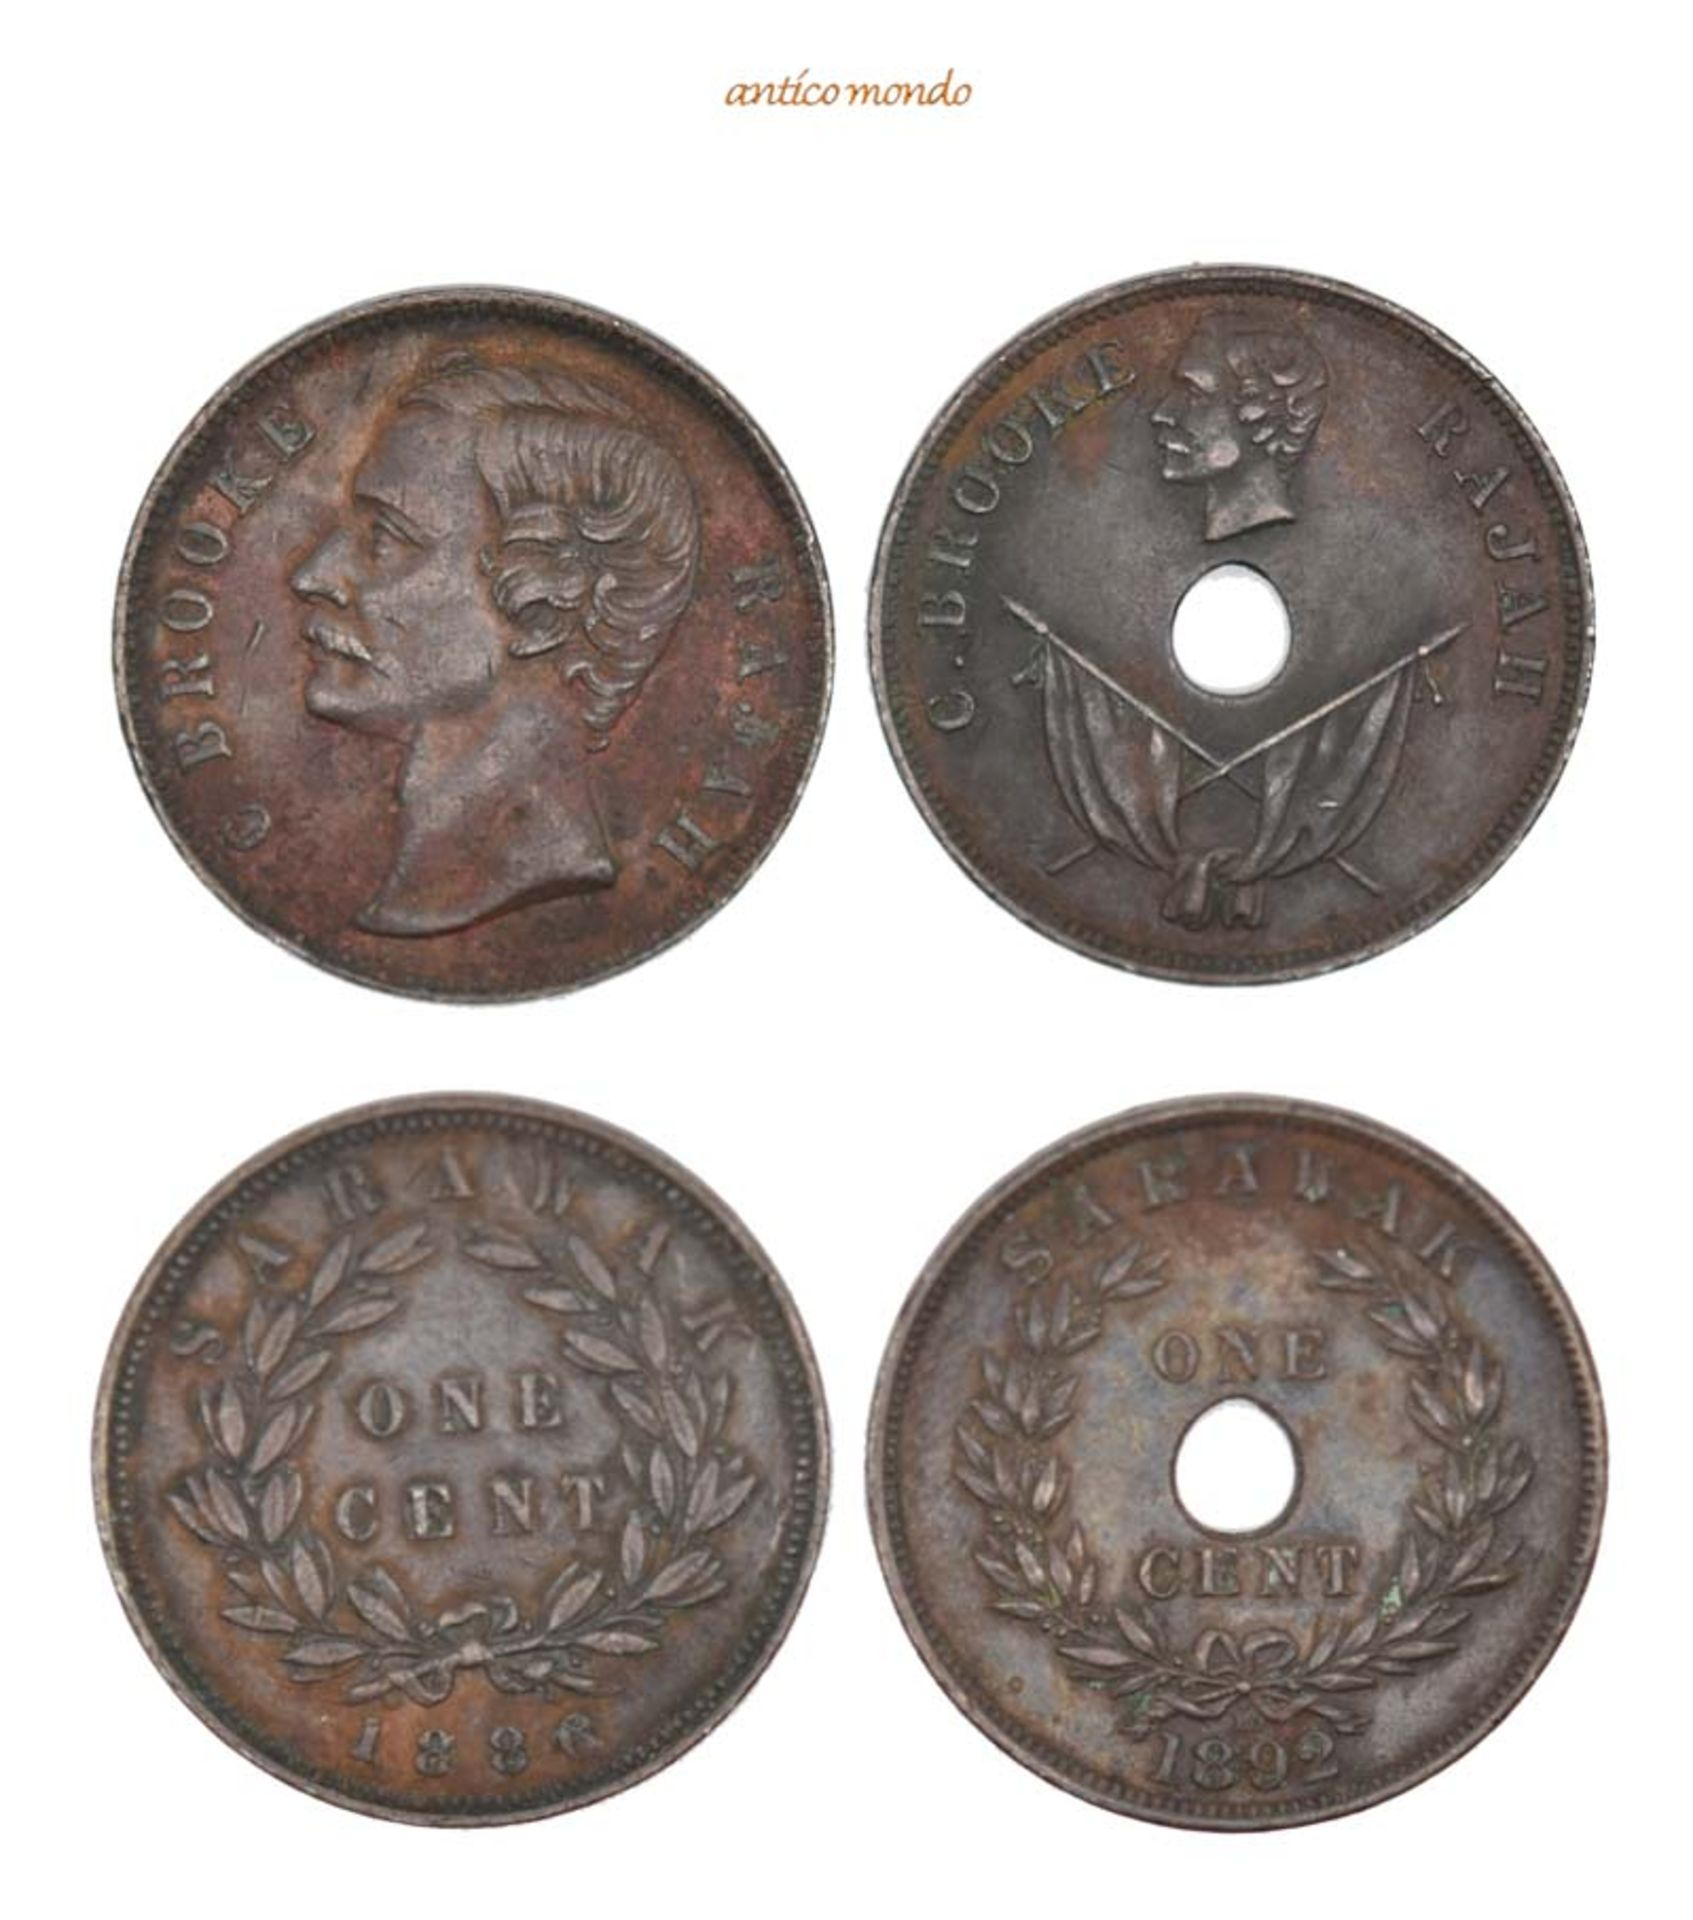 Malaysia, Sarawak, Brooke, 1868-1917, Cent, 1886,1892, sehr schön, 2 Stück- - -21.50 % buyer's